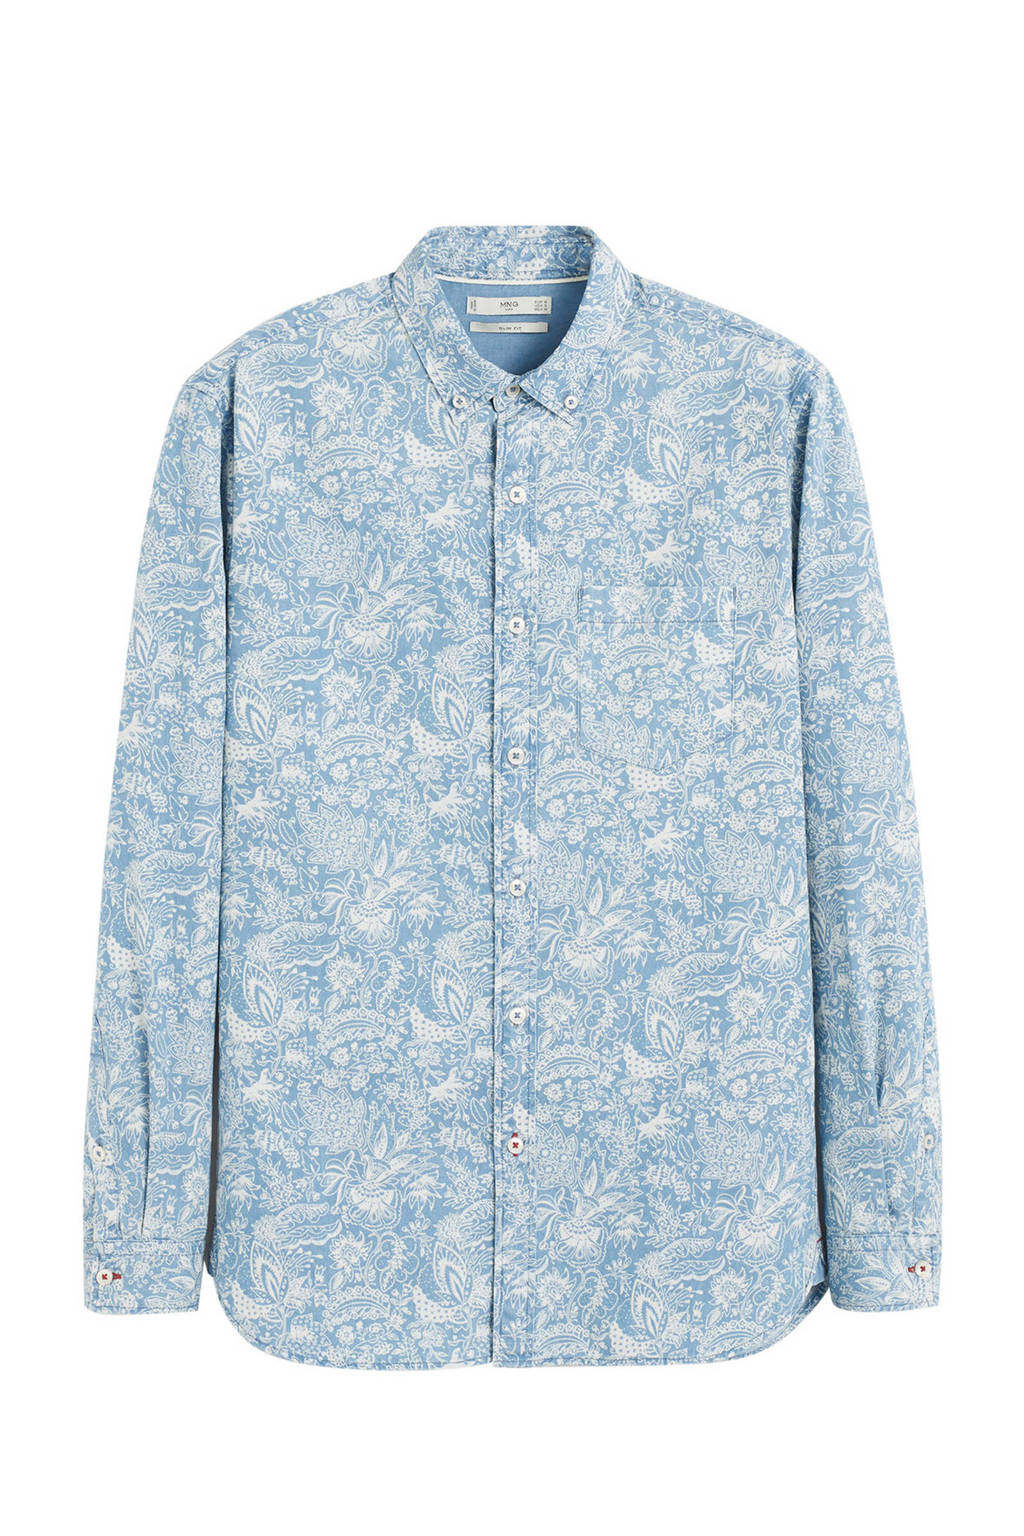 Mango Man gebloemd regular fit overhemd middenblauw